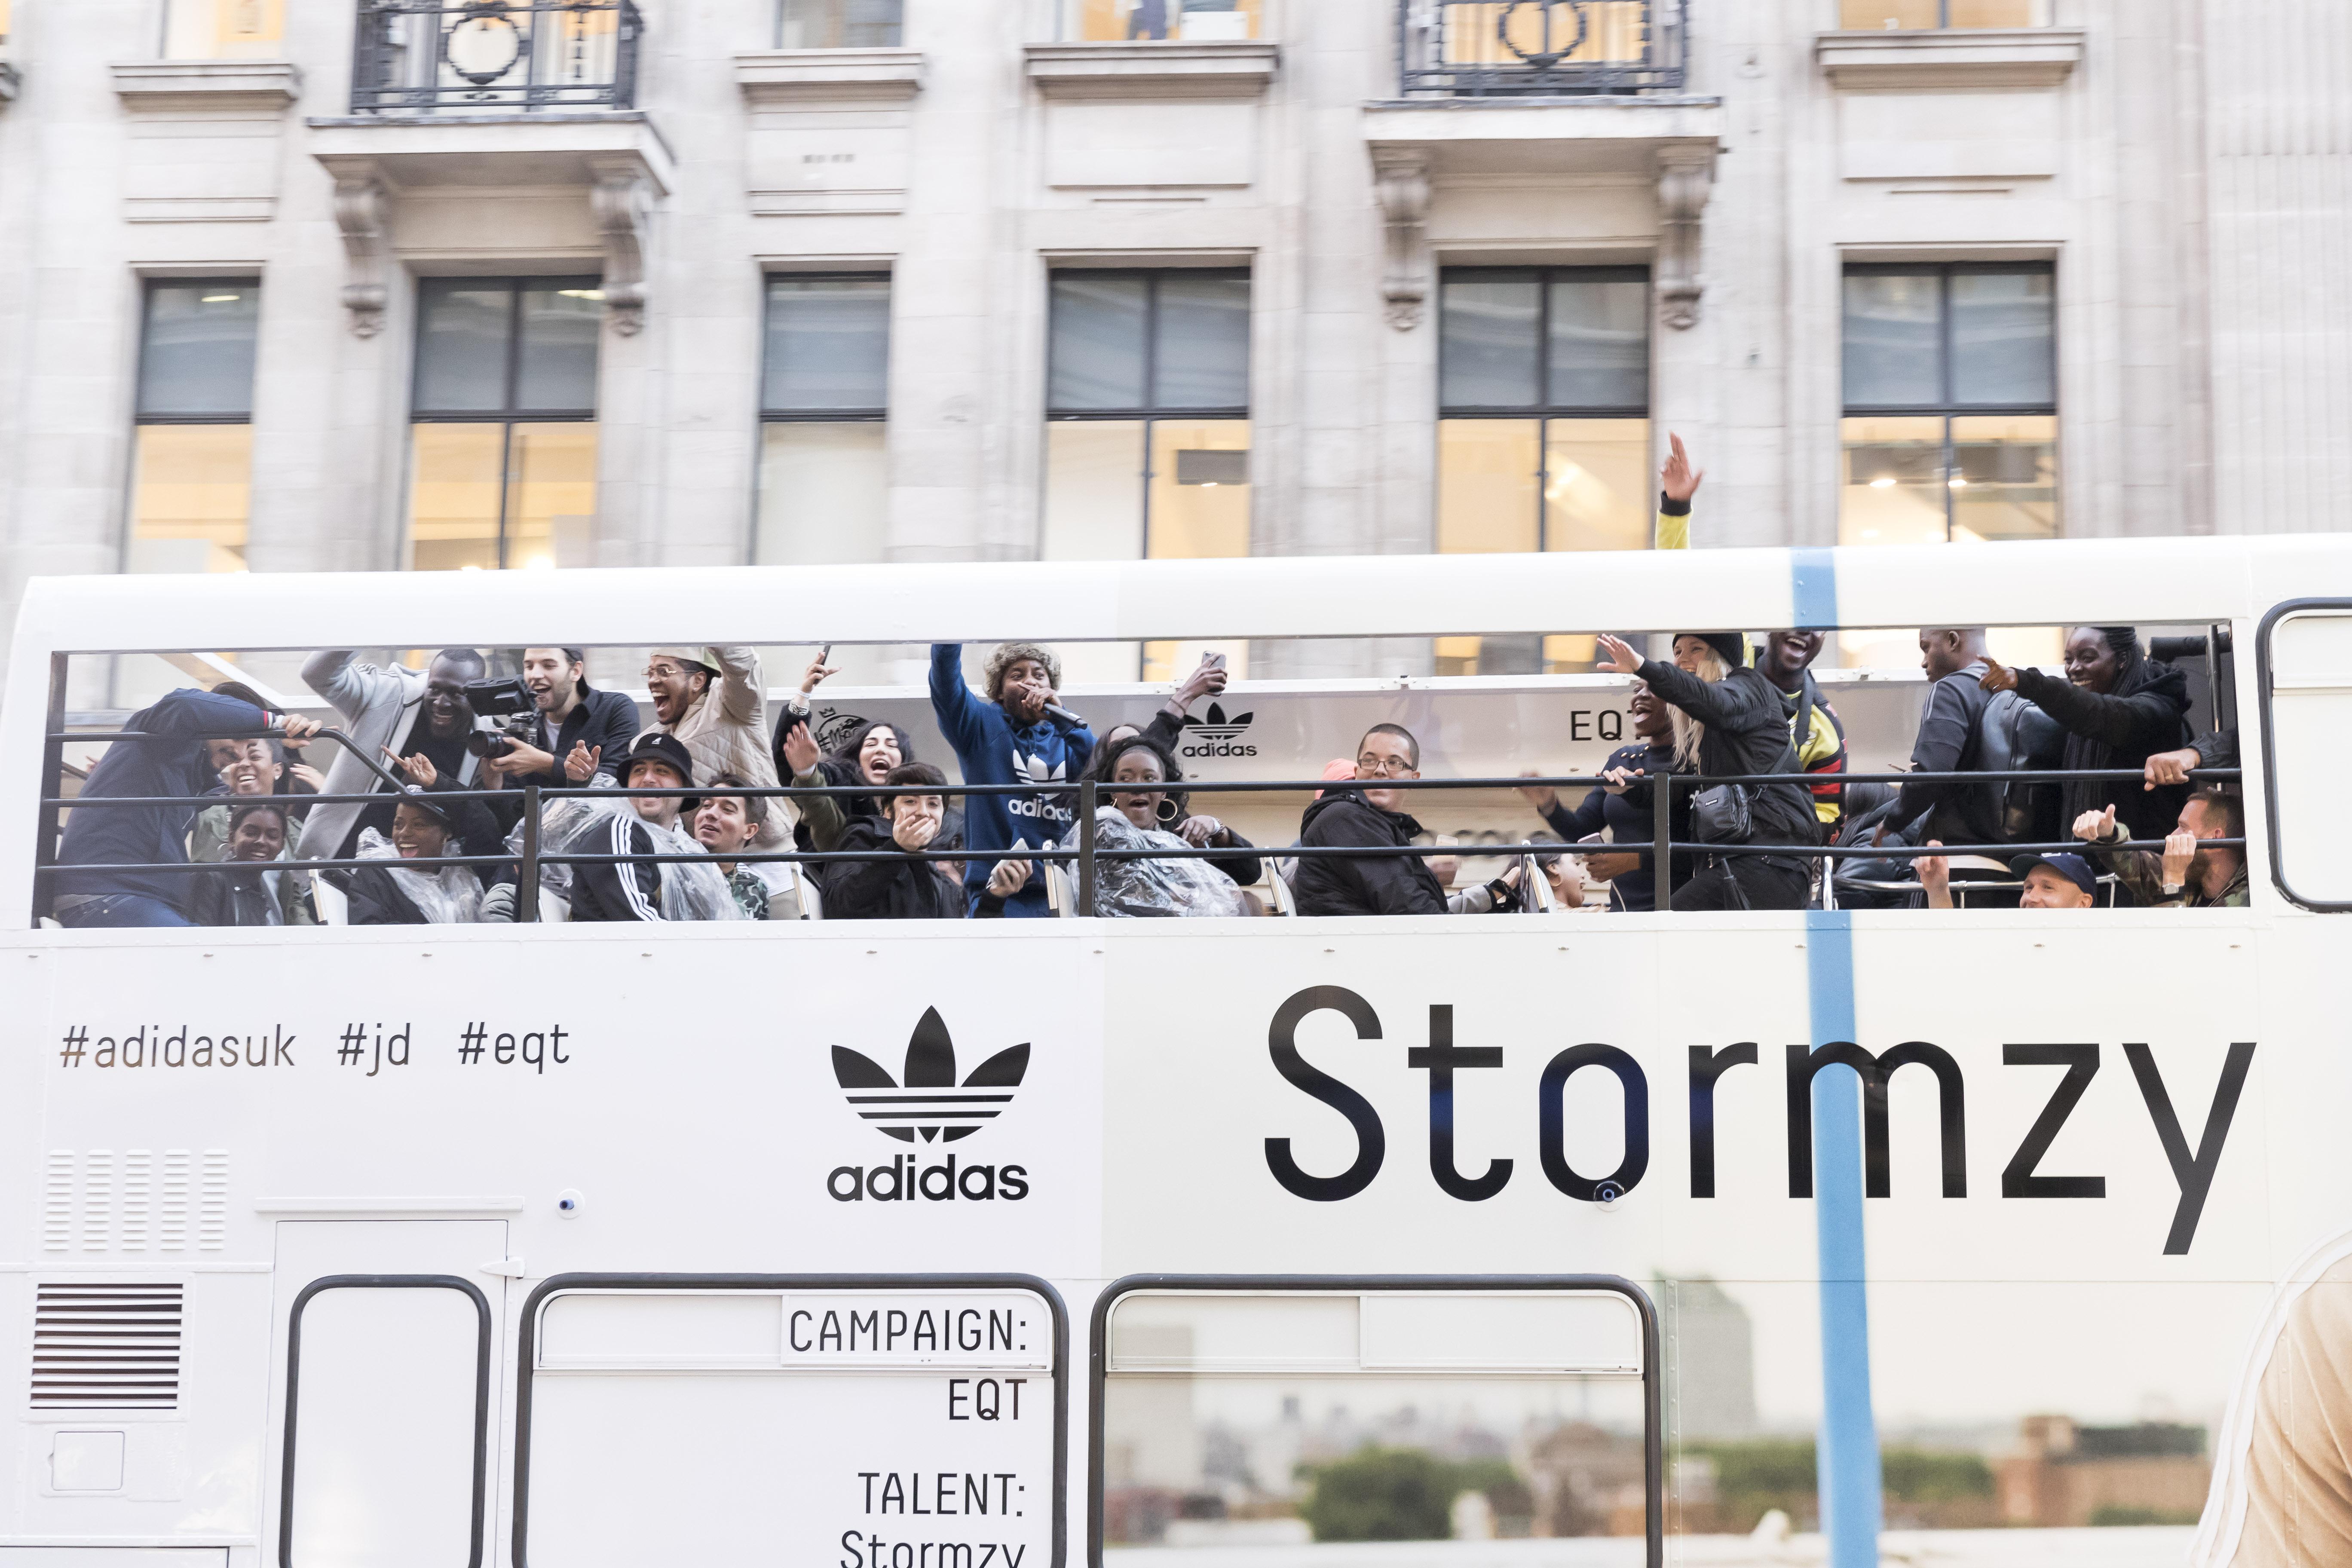 Stormzy shuts down London on double decker bus